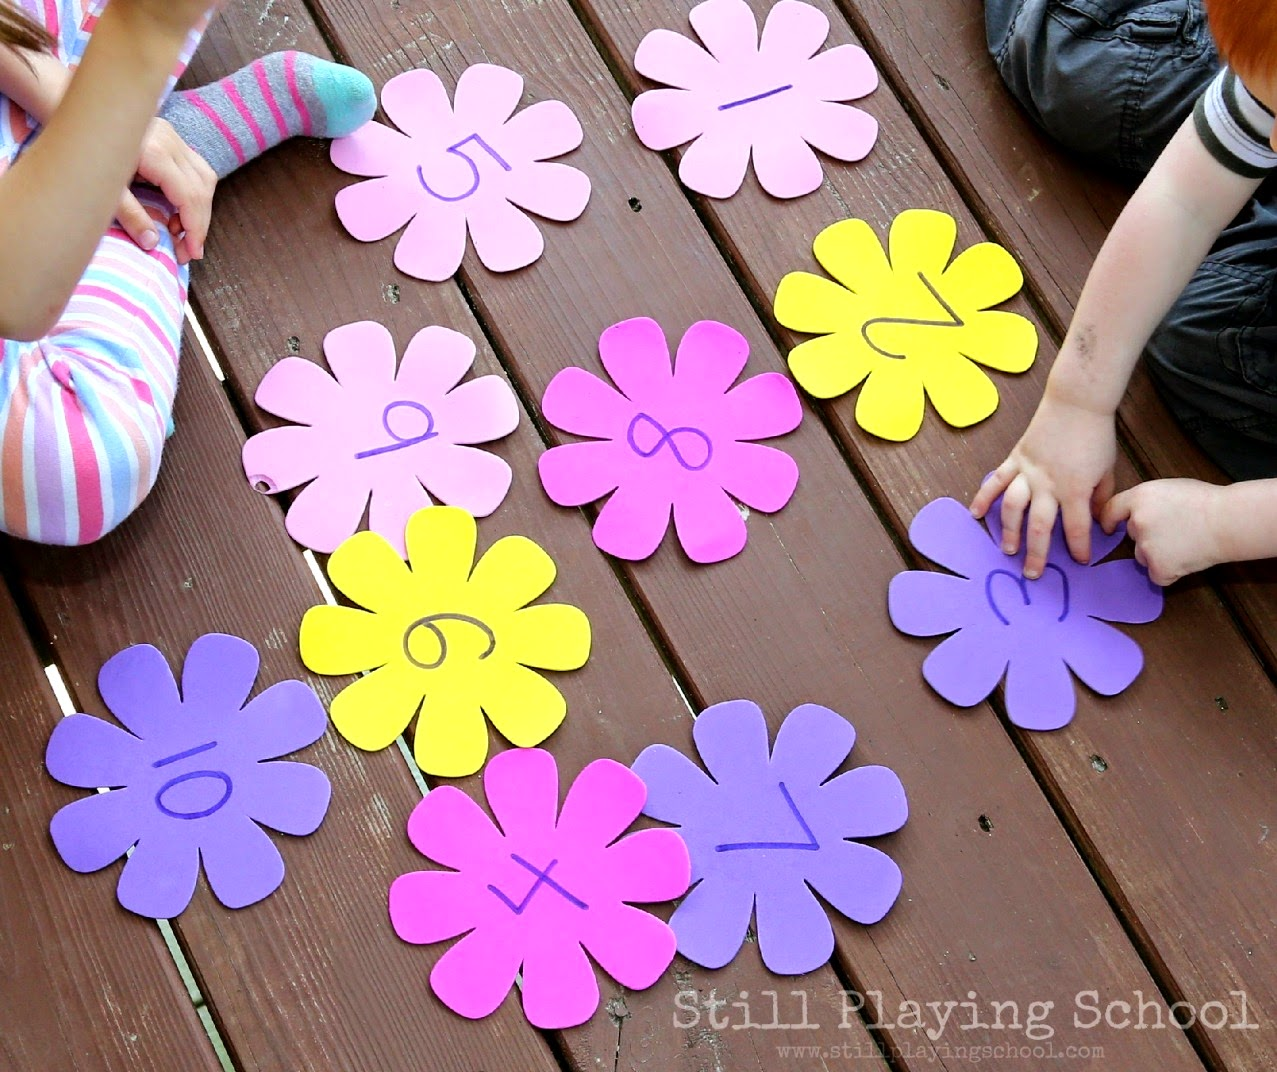 Preschool Number Flower Garden Still Playing School